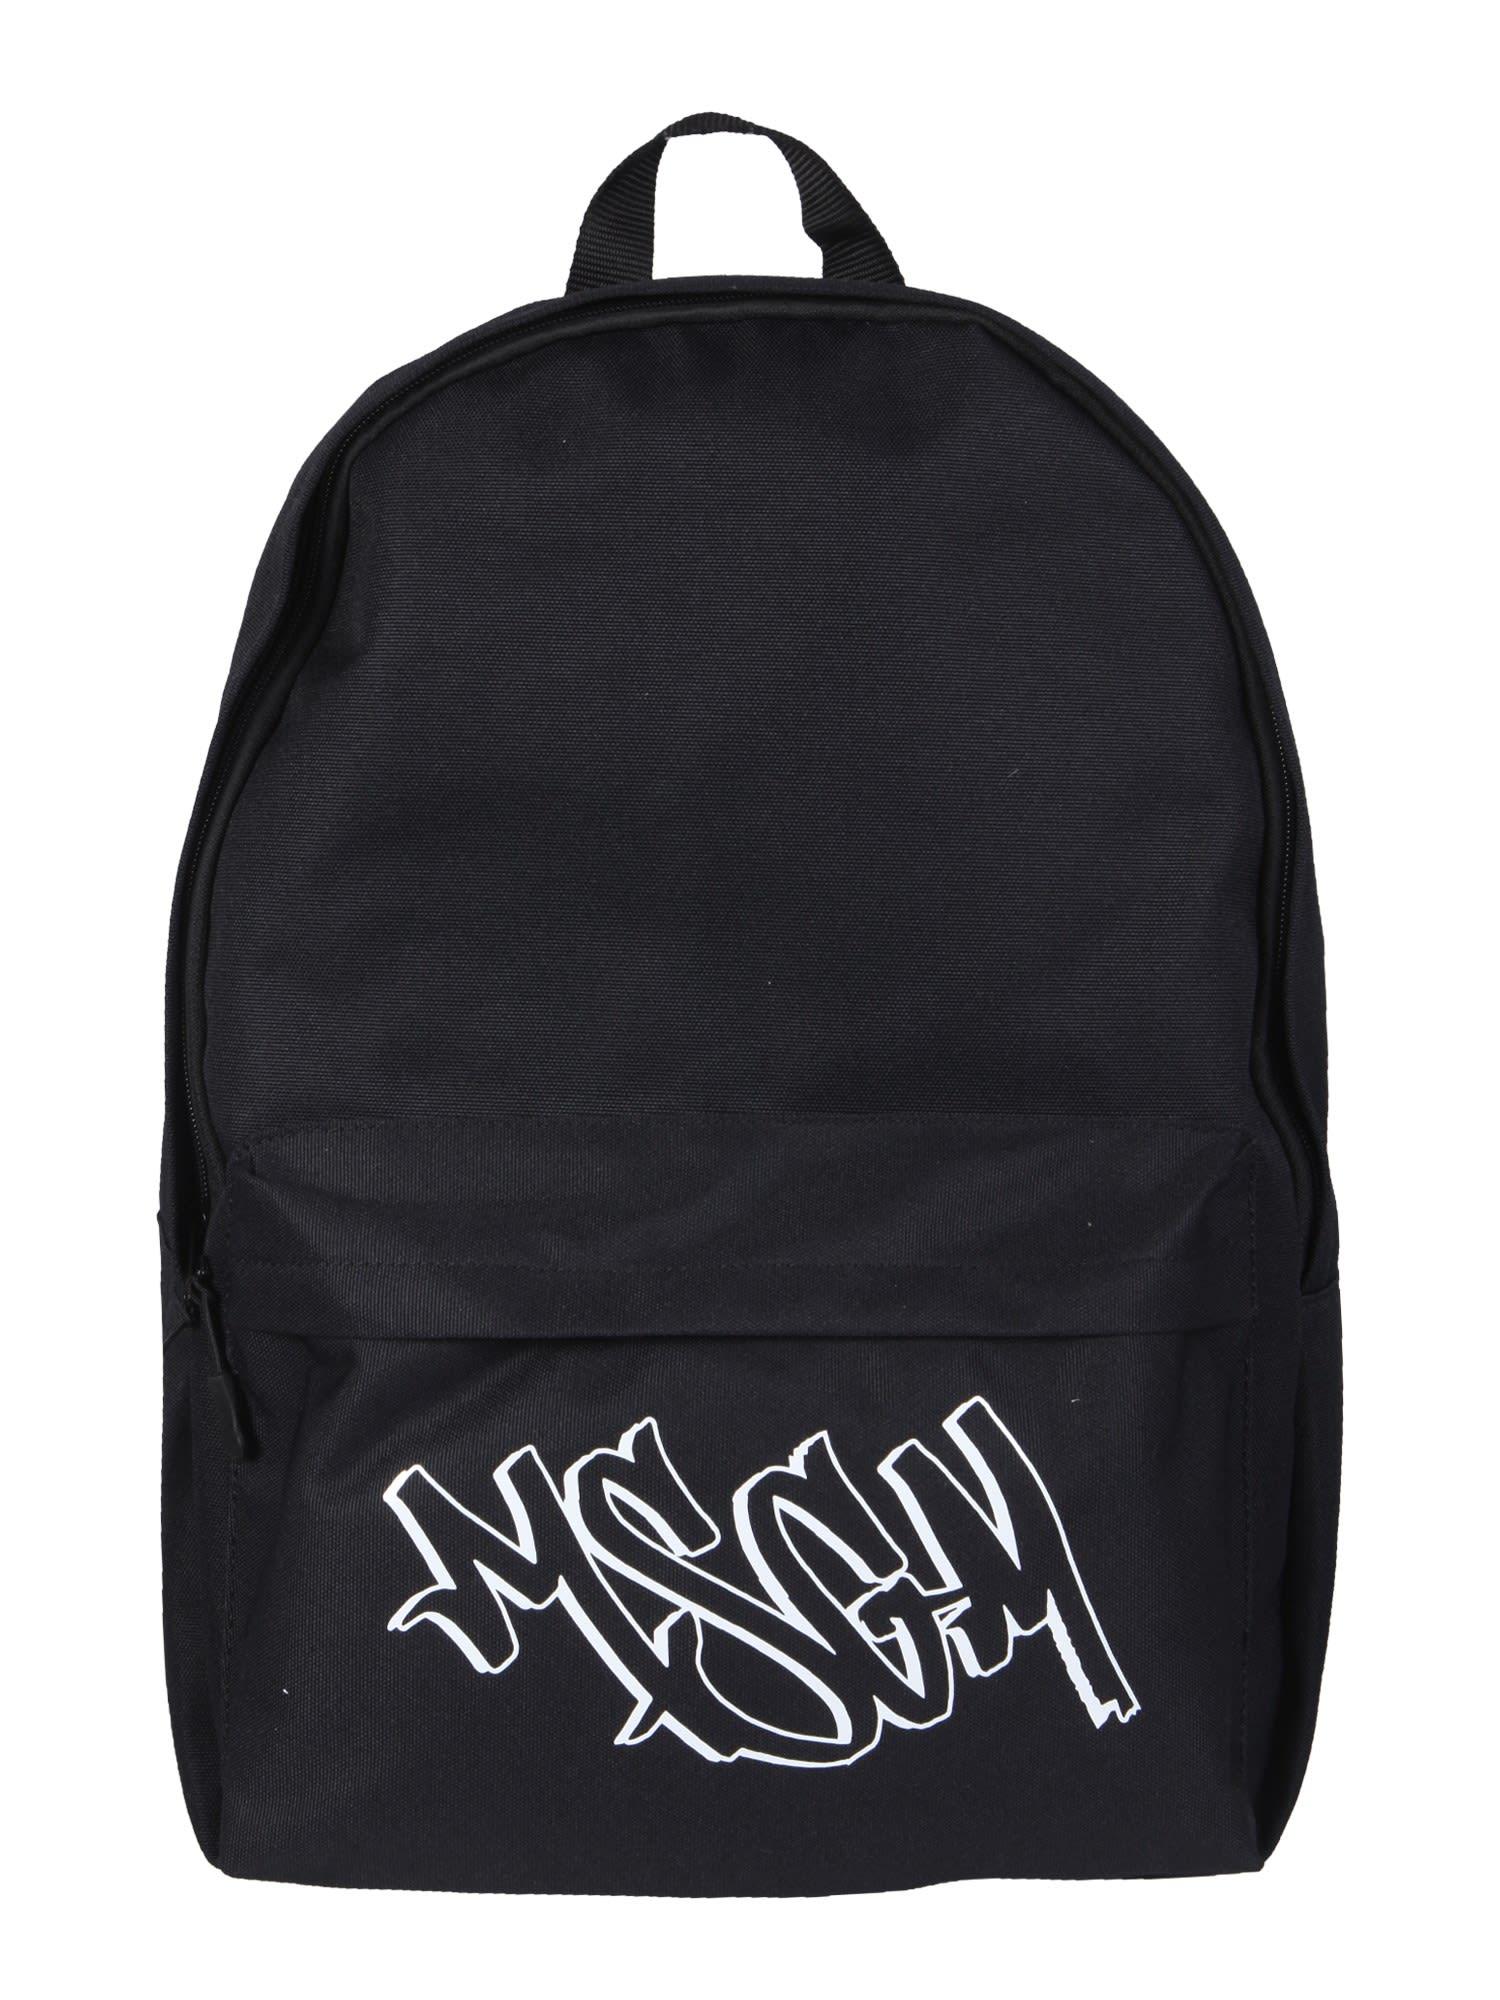 Msgm Backpacks BACKPACK WITH LOGO PRINT